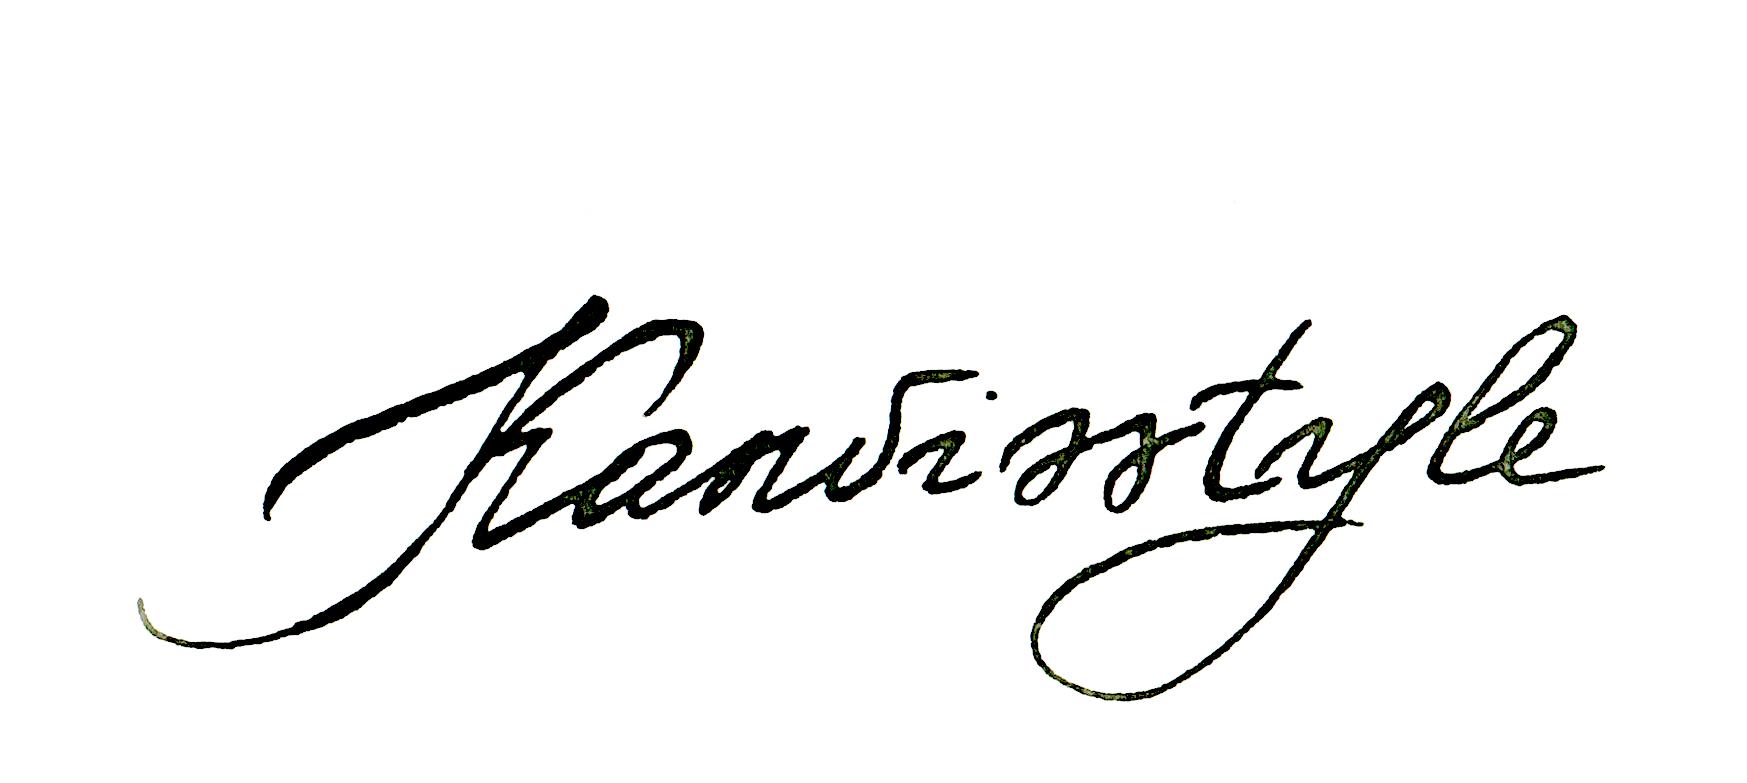 KANVISSTYLE's Signature